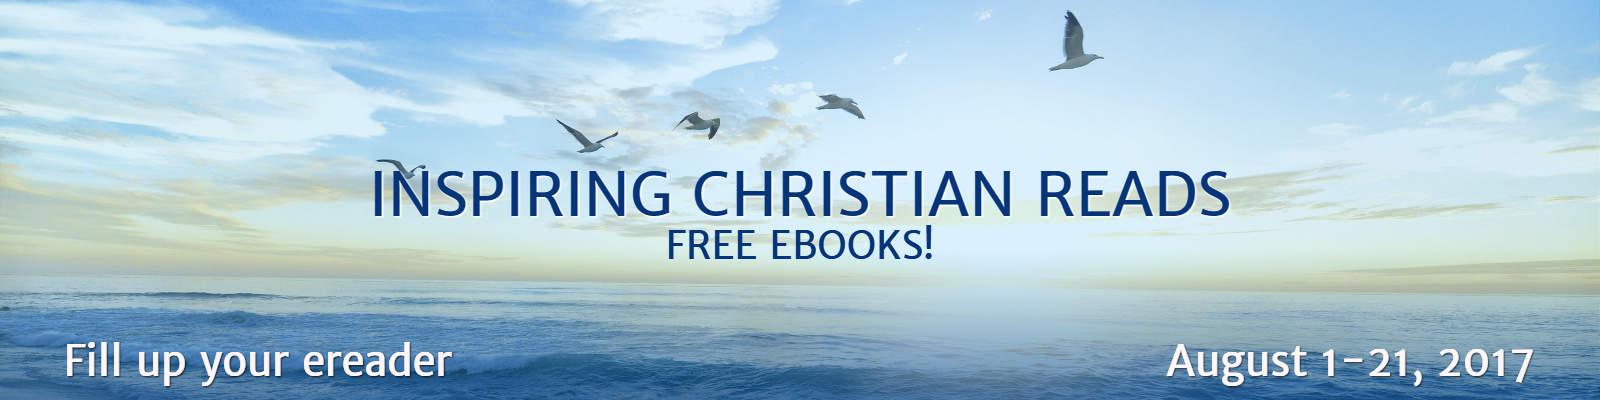 Inspiring Christian Reads